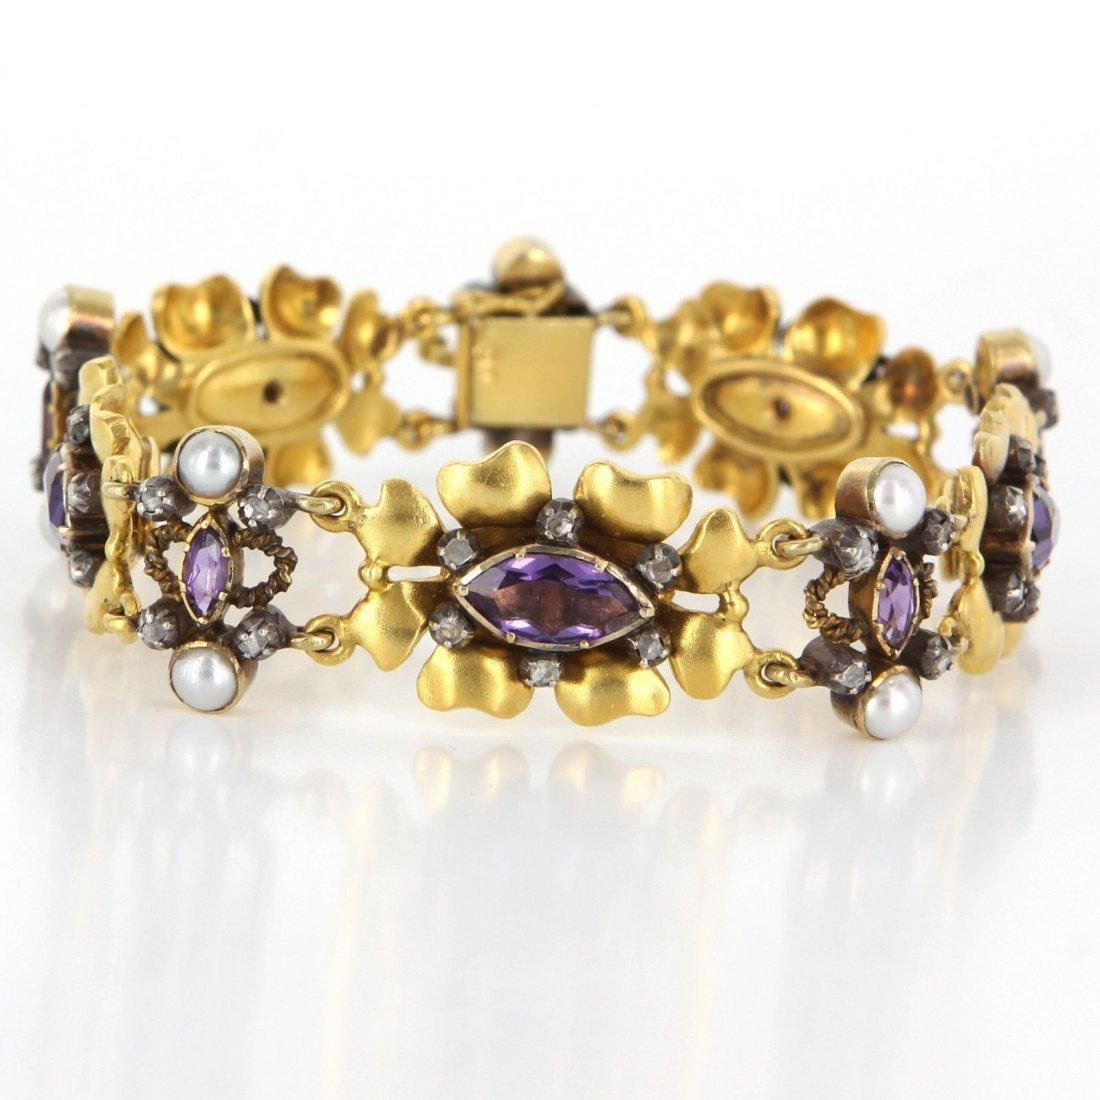 Antique Art Deco 18 Karat Yellow Gold Amethyst Diamond